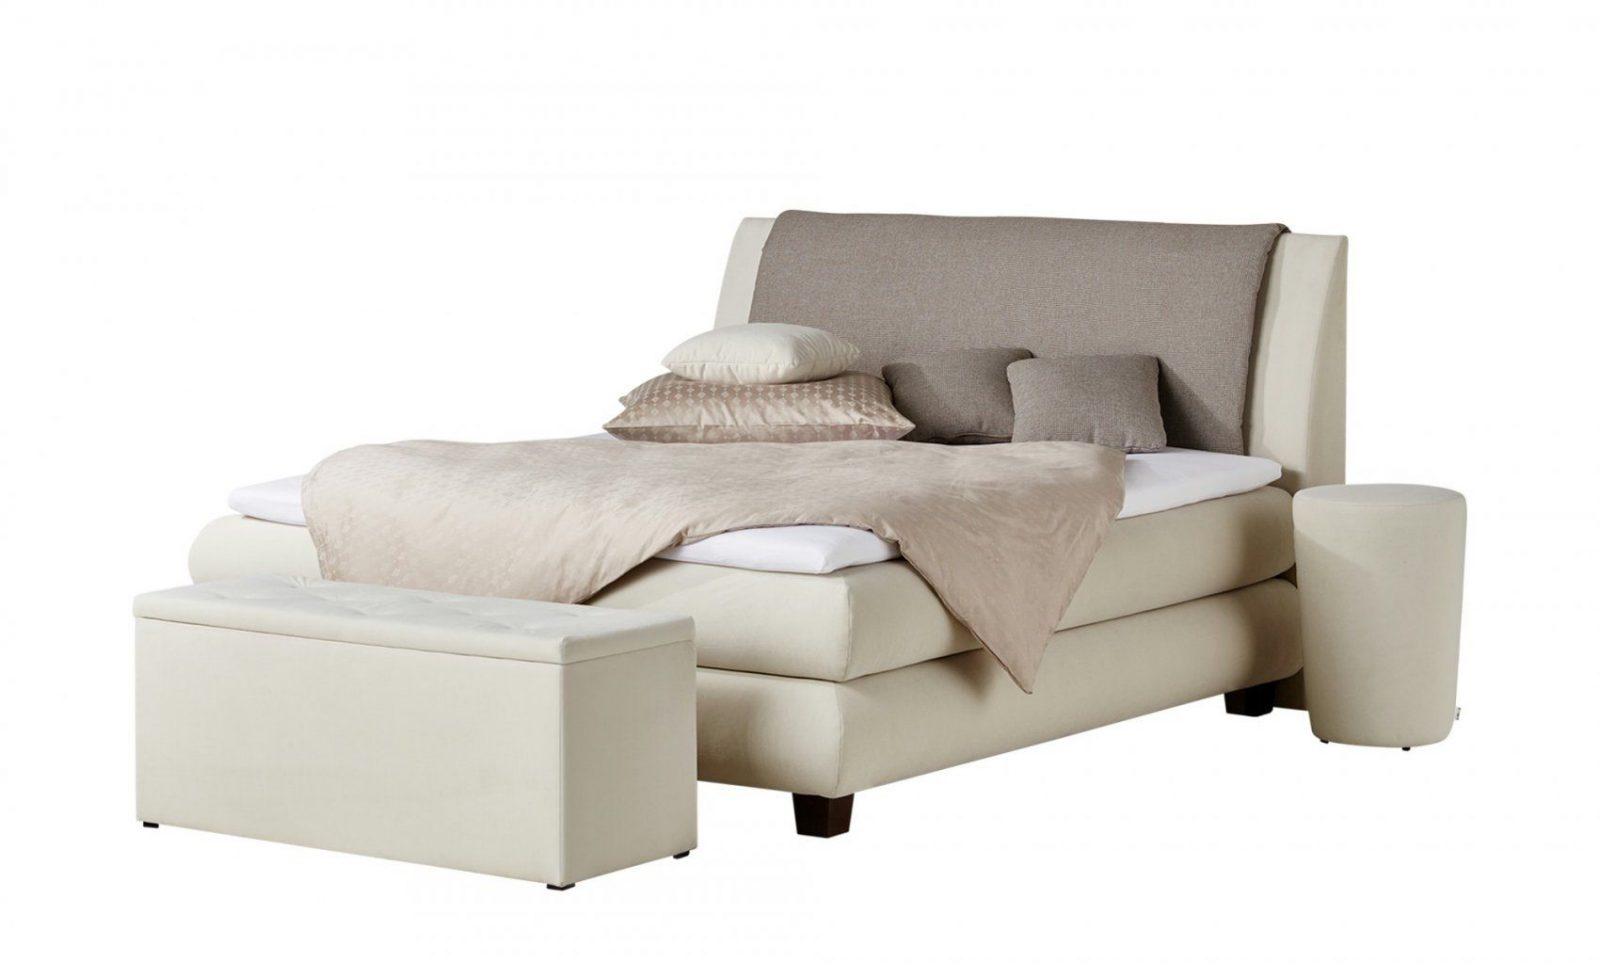 Smart Boxspringbett Premium  Bei Möbel Kraft Online Kaufen von Smart Boxspringbett Premium Bild